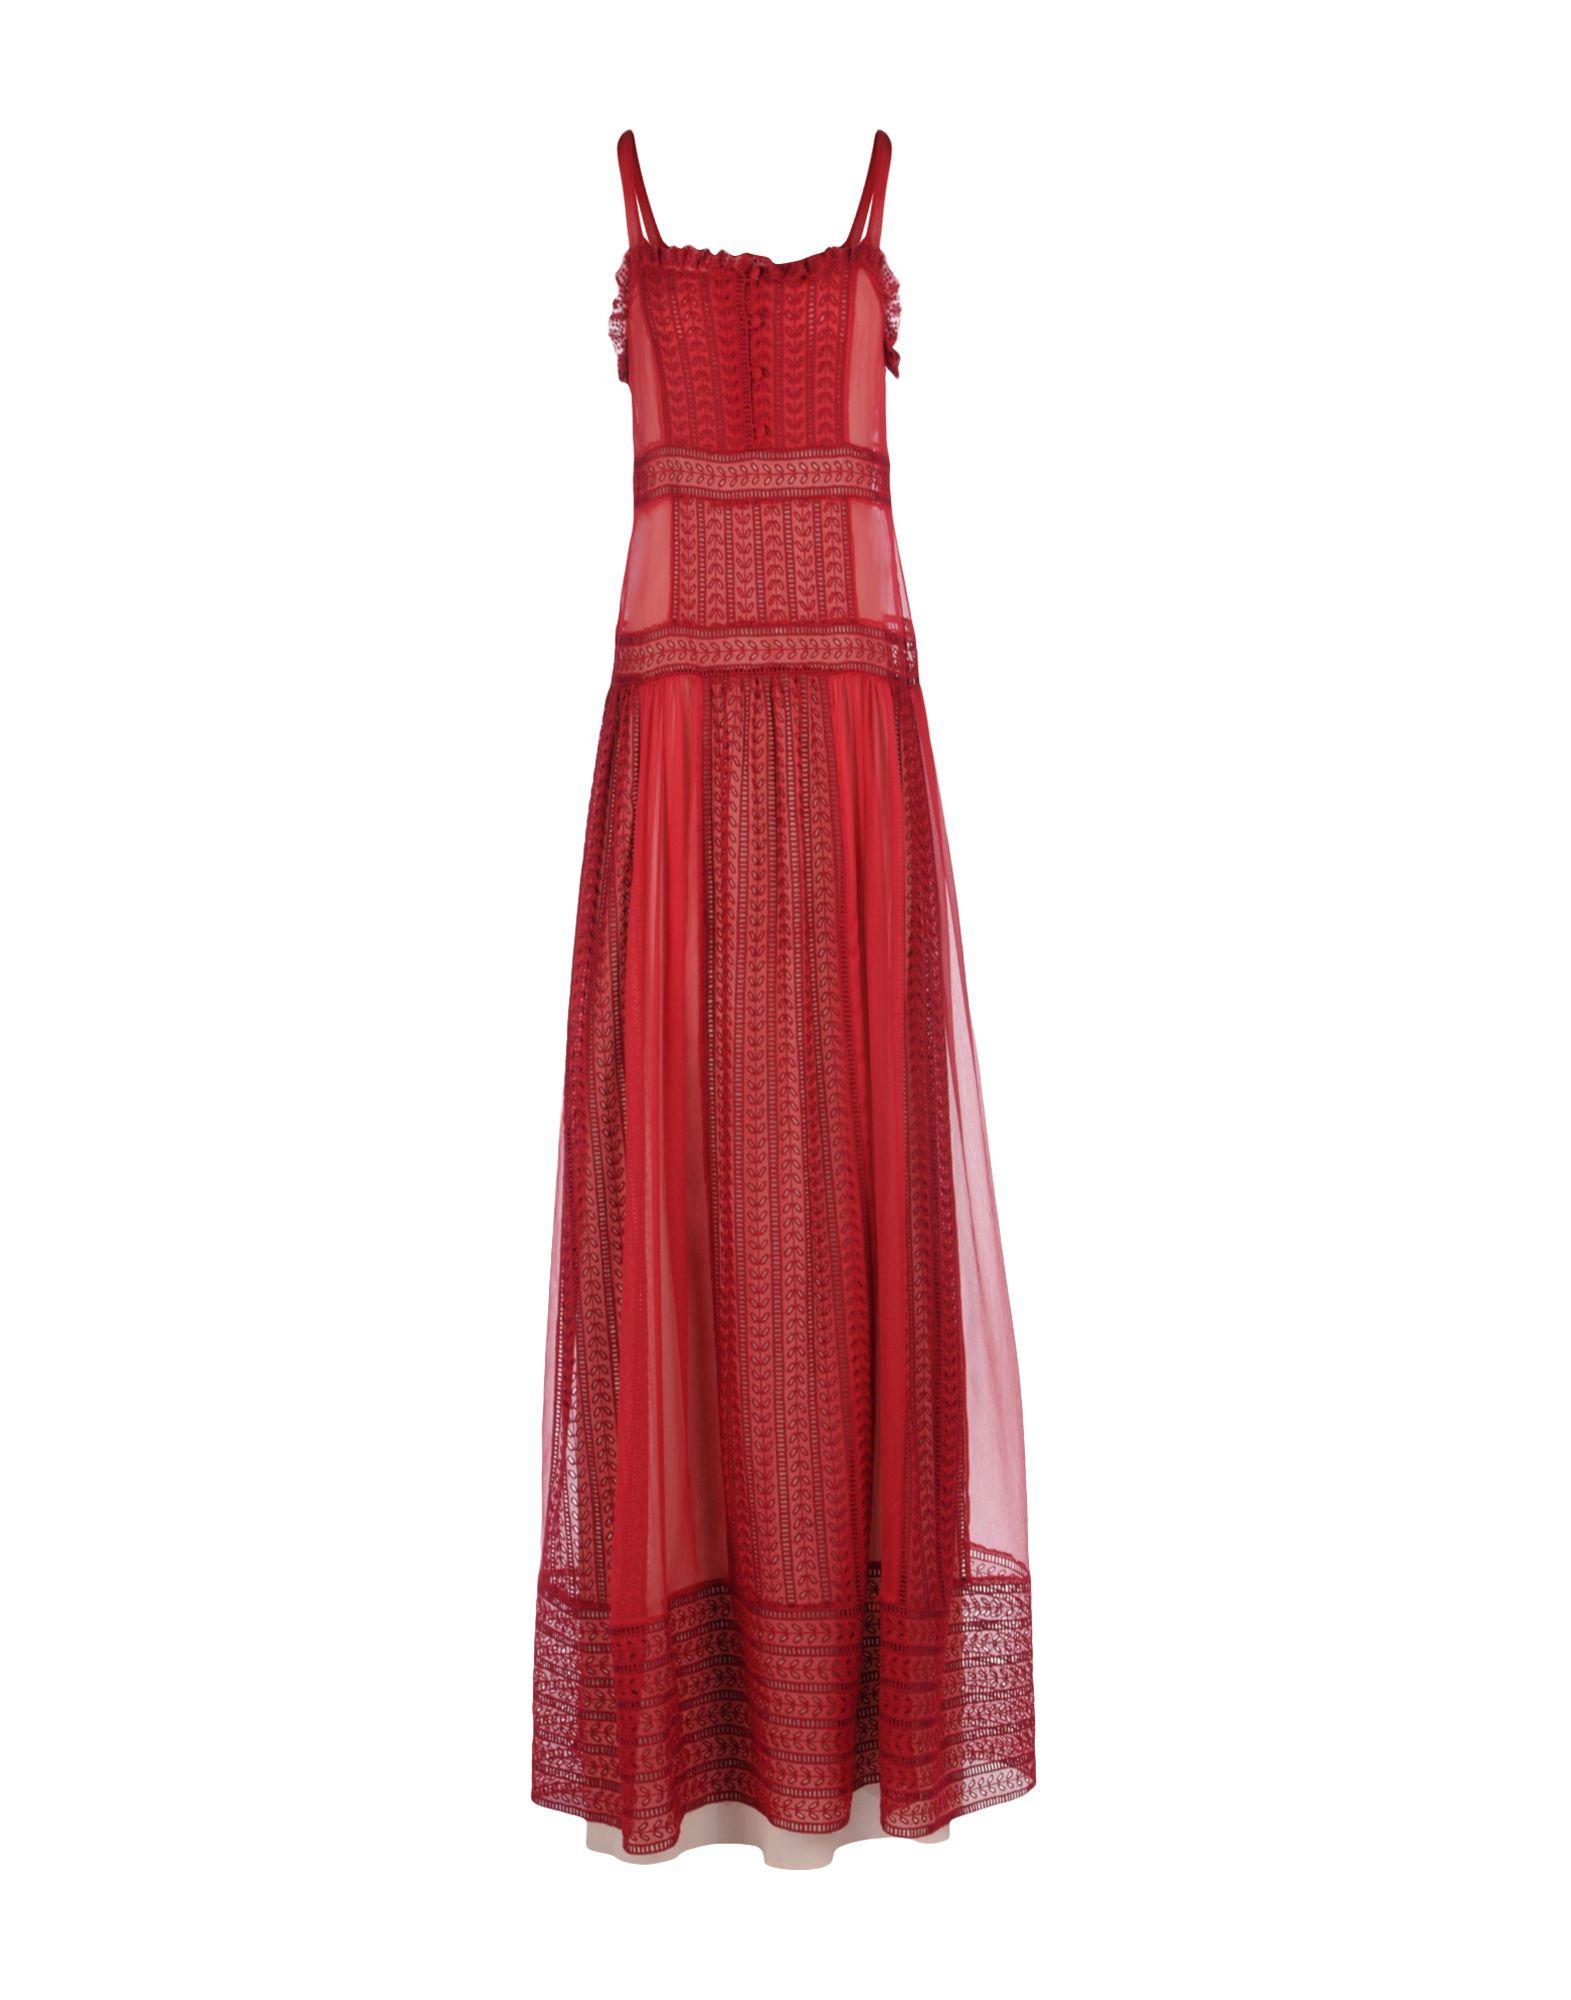 PHILOSOPHY di LORENZO SERAFINI Damen Langes Kleid Farbe Purpur Größe 6 - broschei